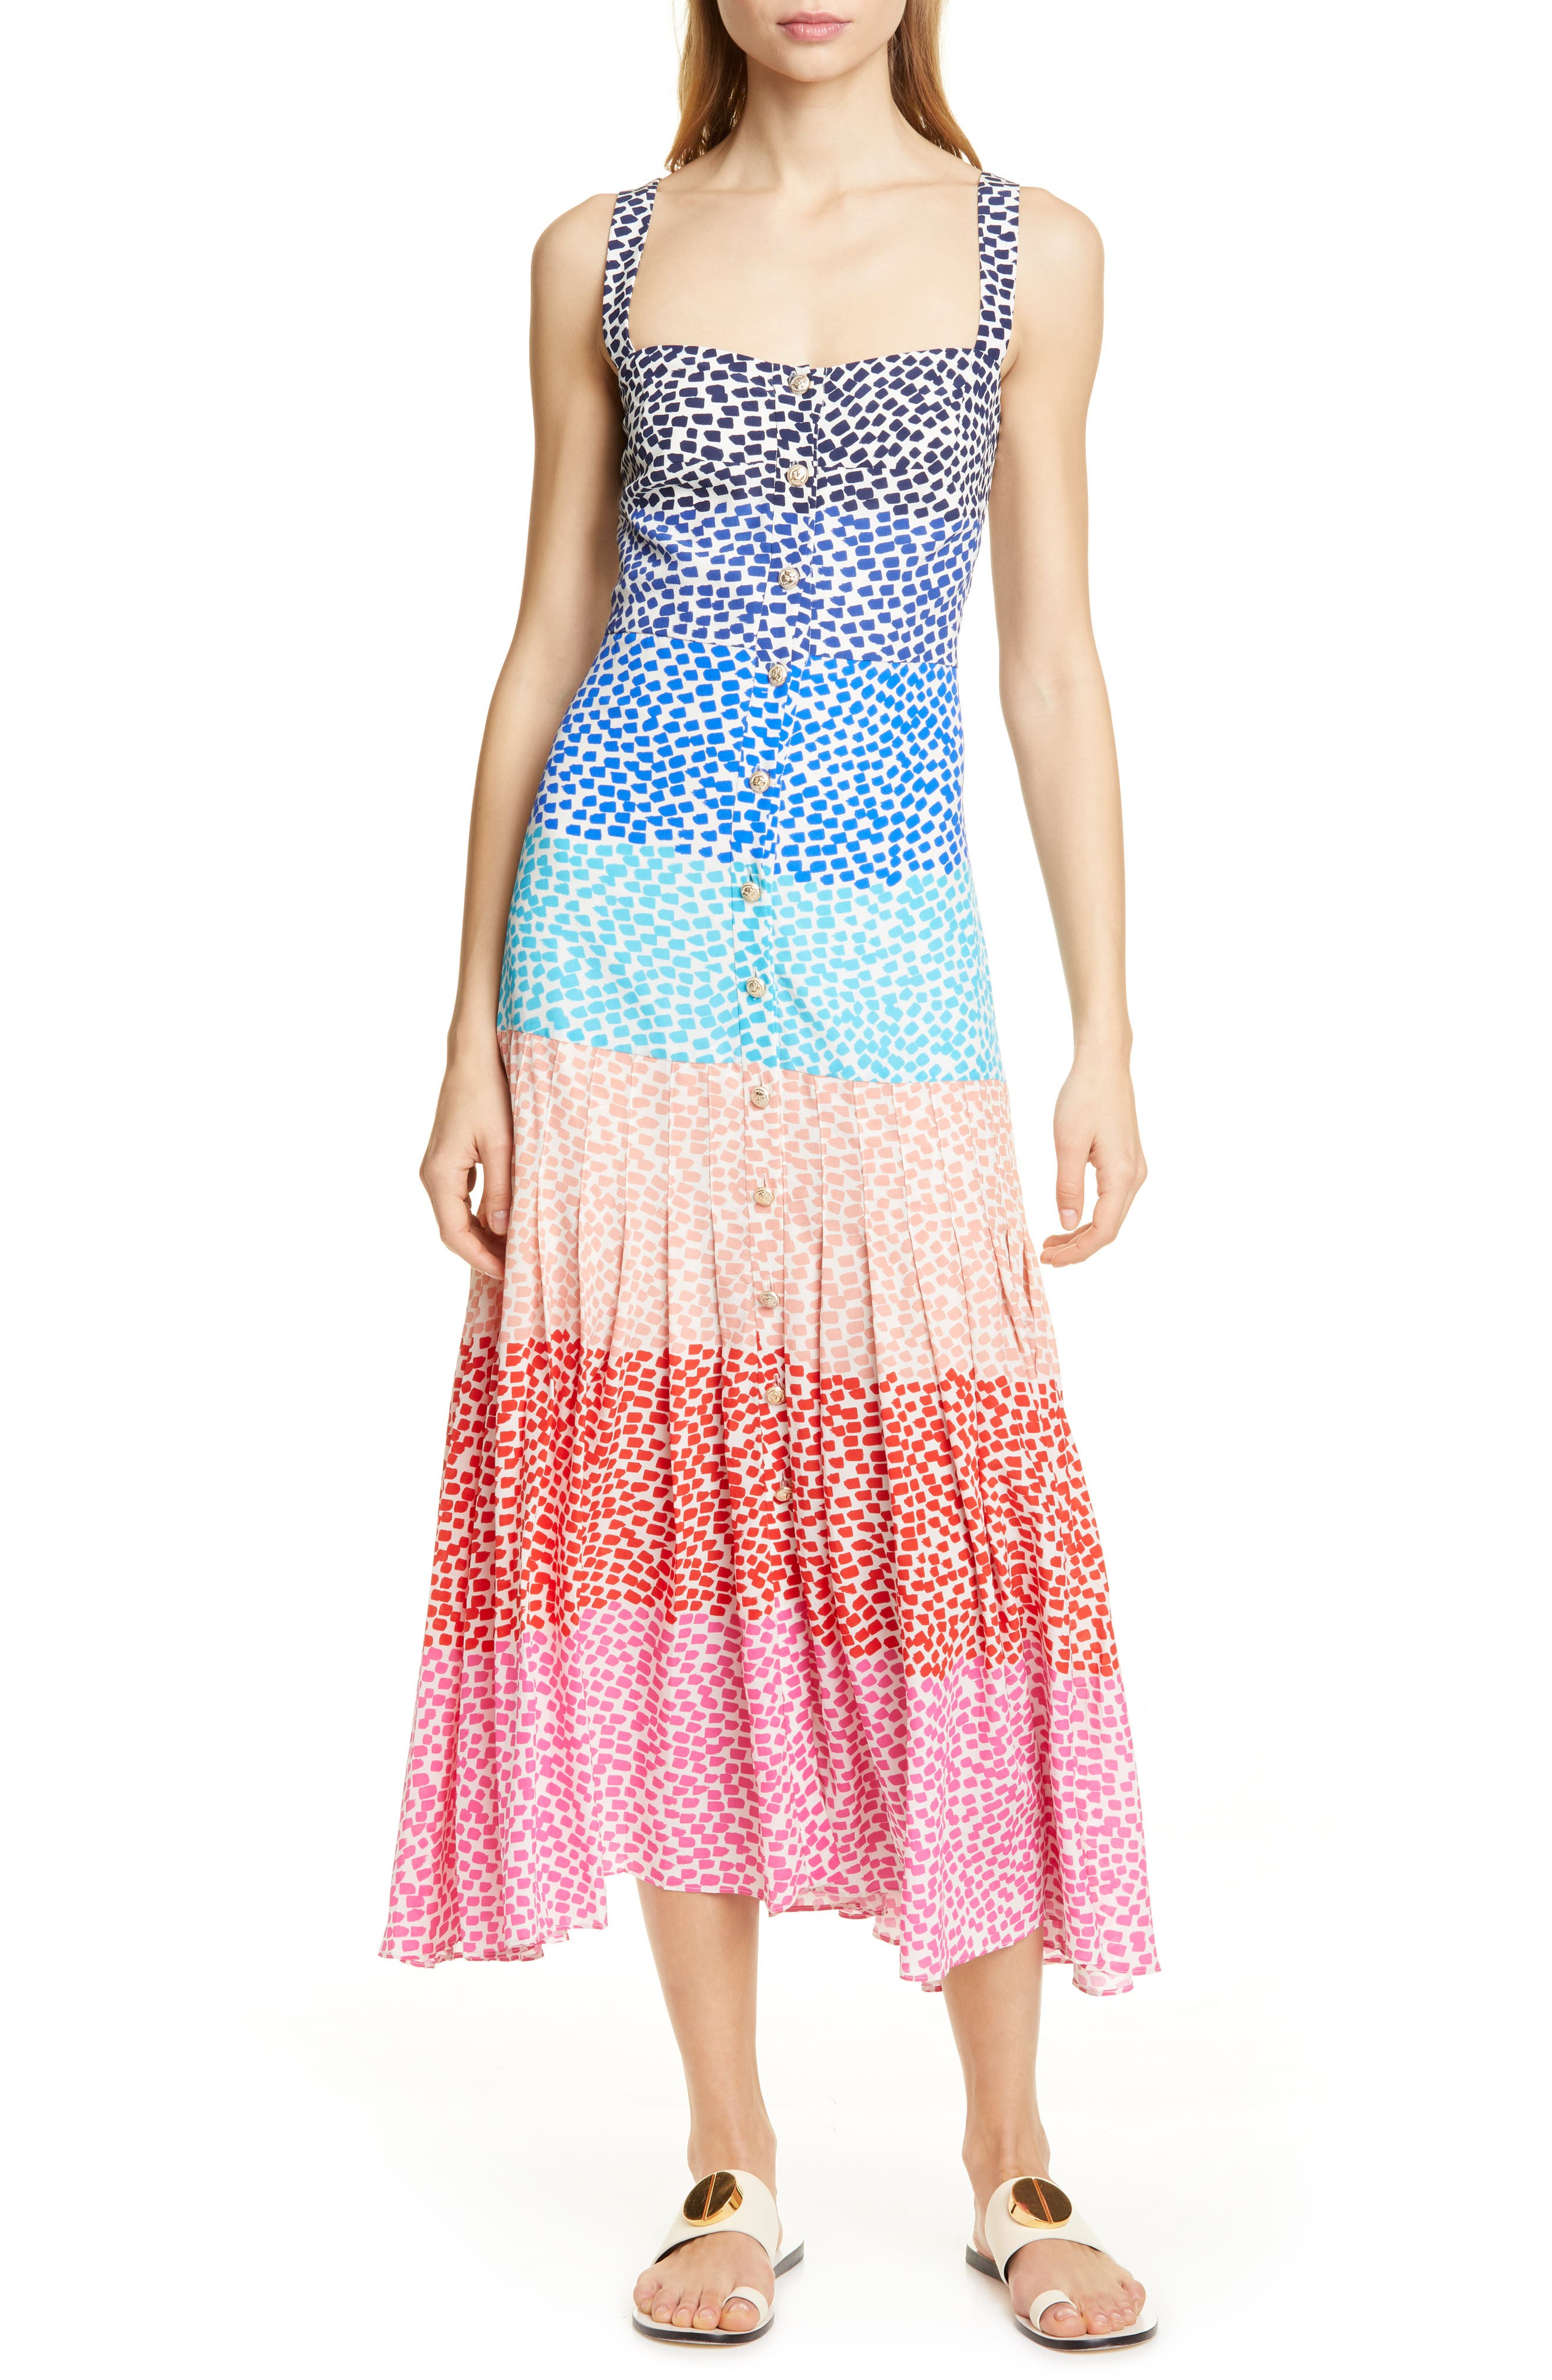 SALONI, Karen Stripe Silk Dress, Main thumbnail 1, color, RAINBOW GRADIENT PLMT